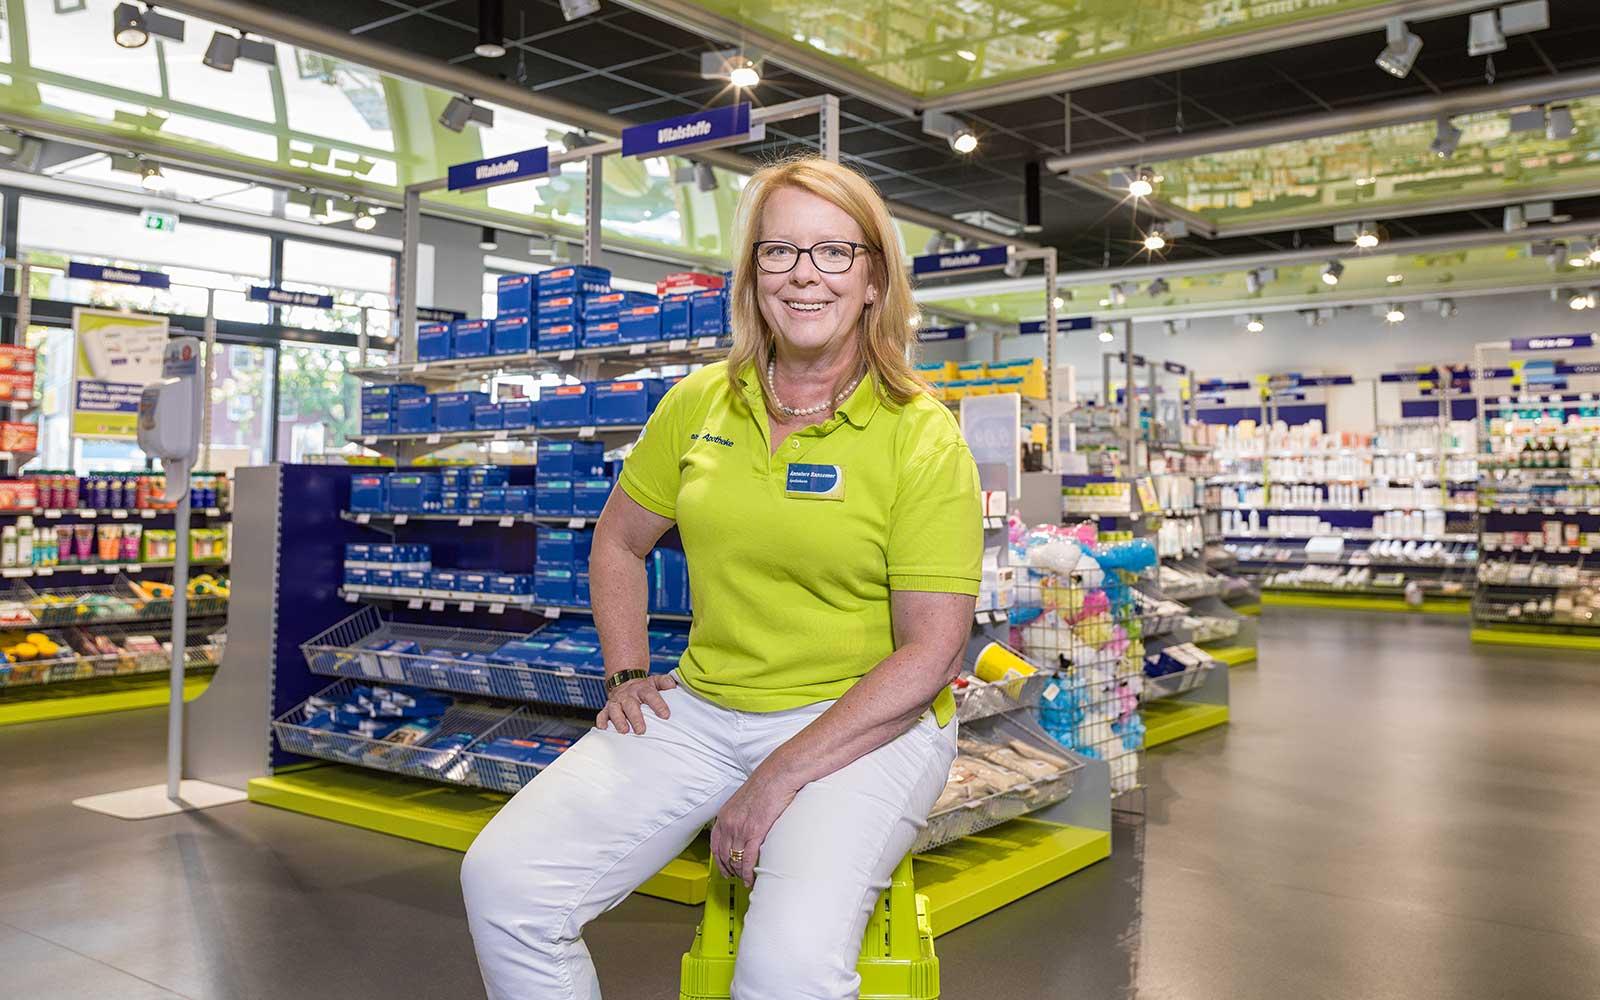 Apothekerin Annelore Bansemer in ihrer easyApotheke in Nenndorf